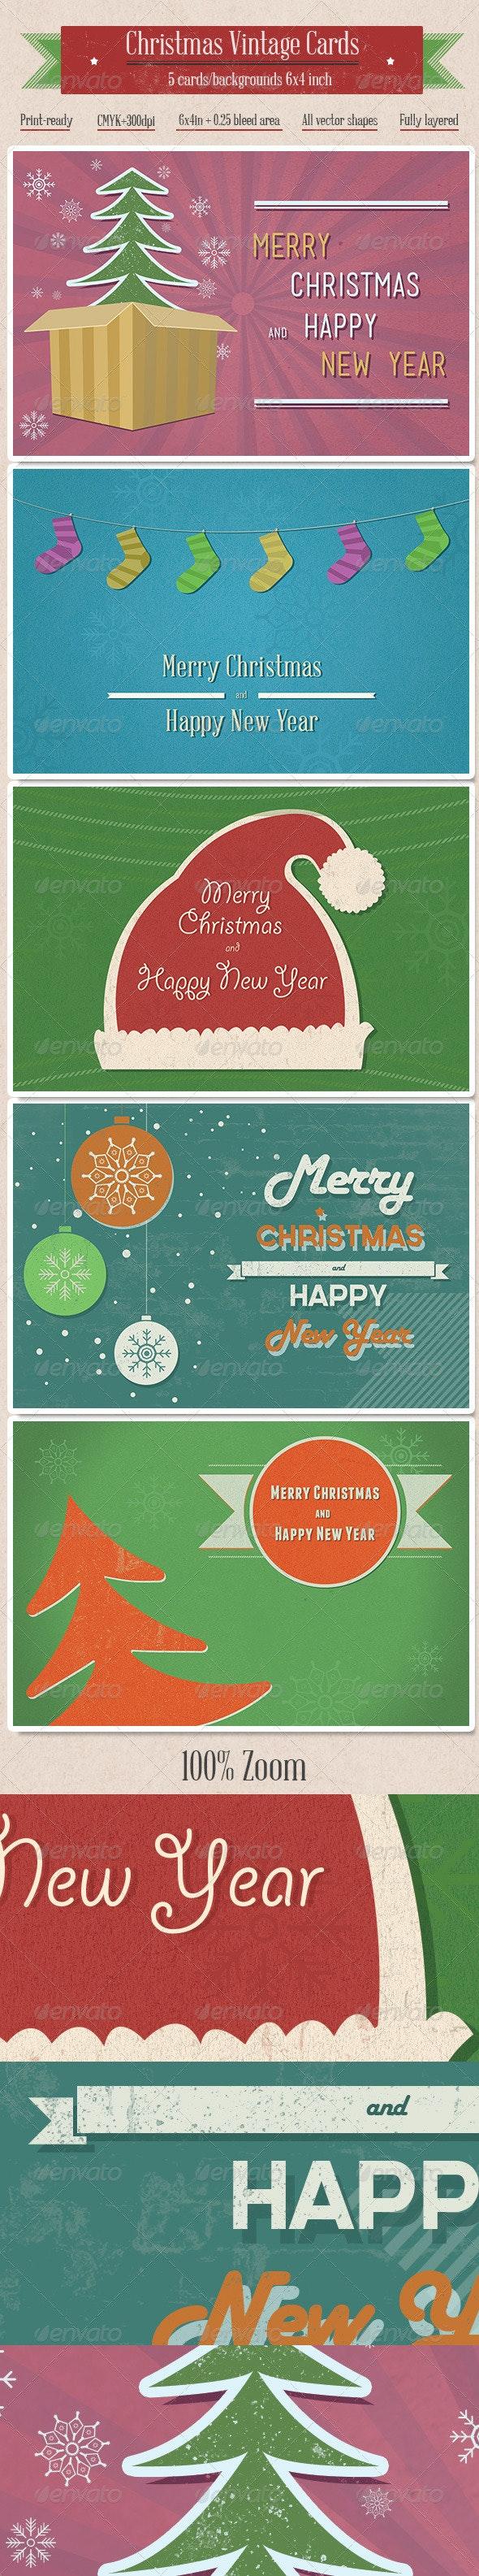 5 Vintage Christmas Cards/Backgrounds - Retro/Vintage Business Cards